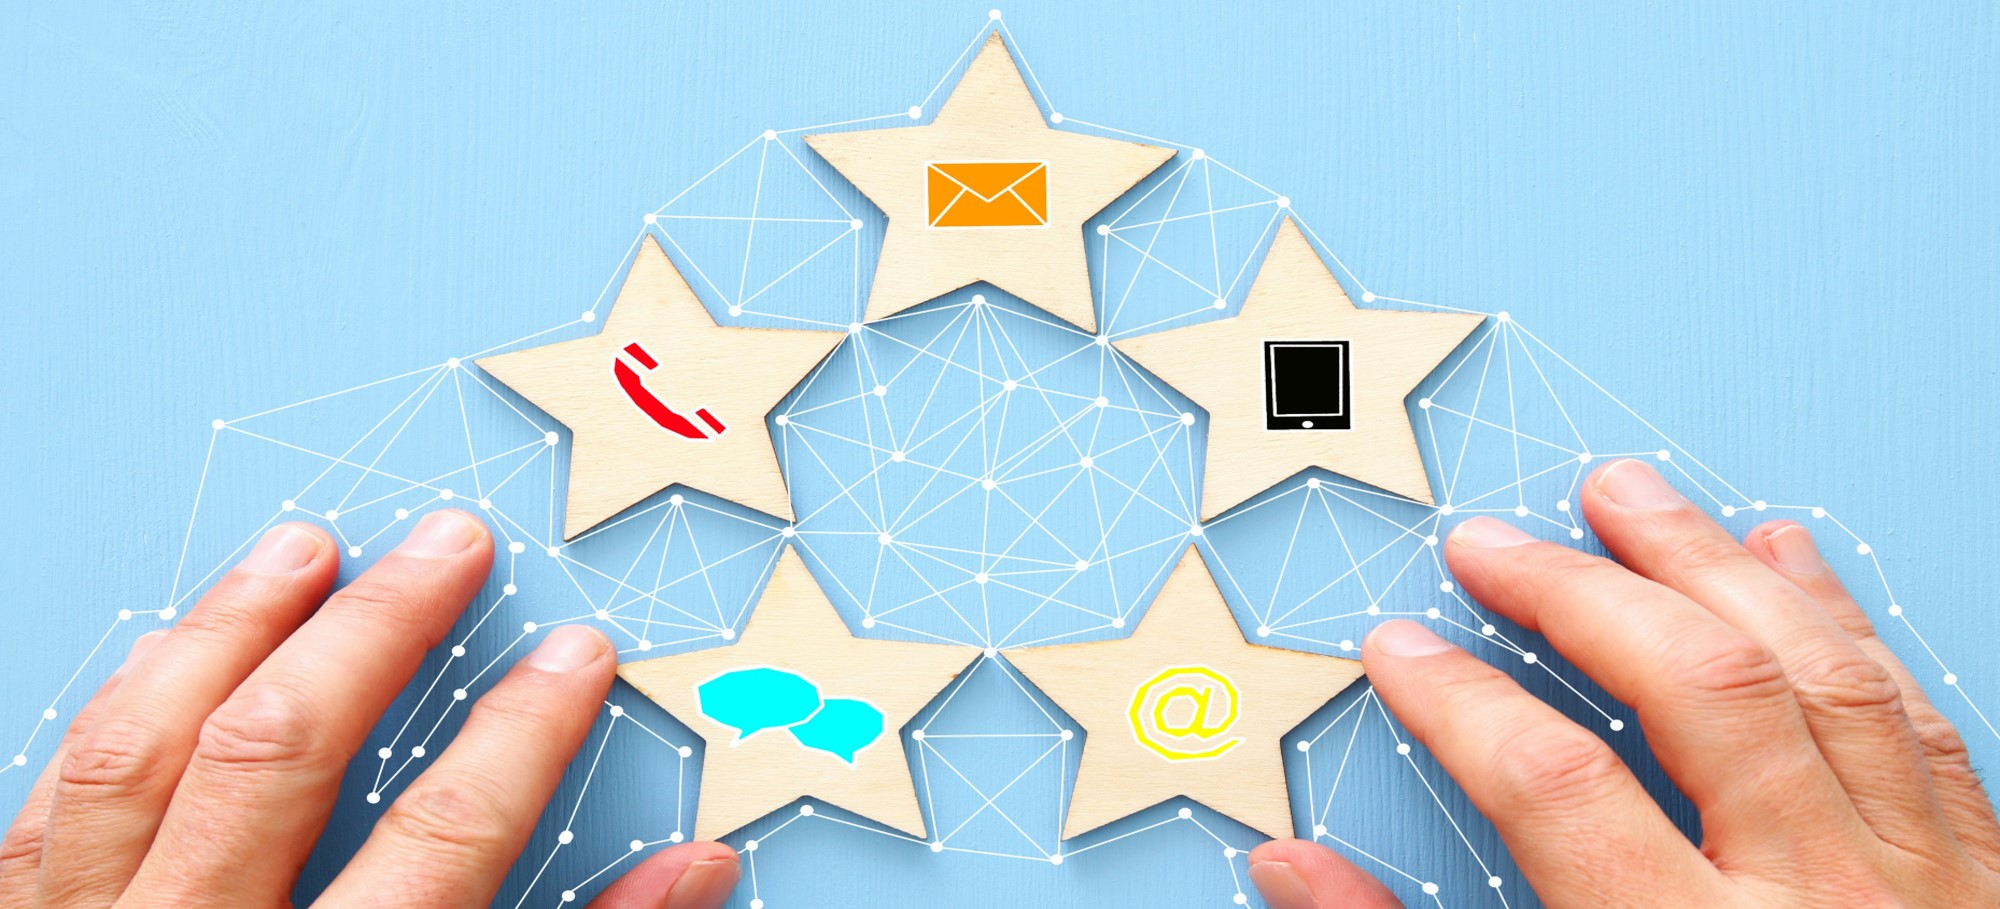 How Brands Can Create a Seamless CX Through Compliance